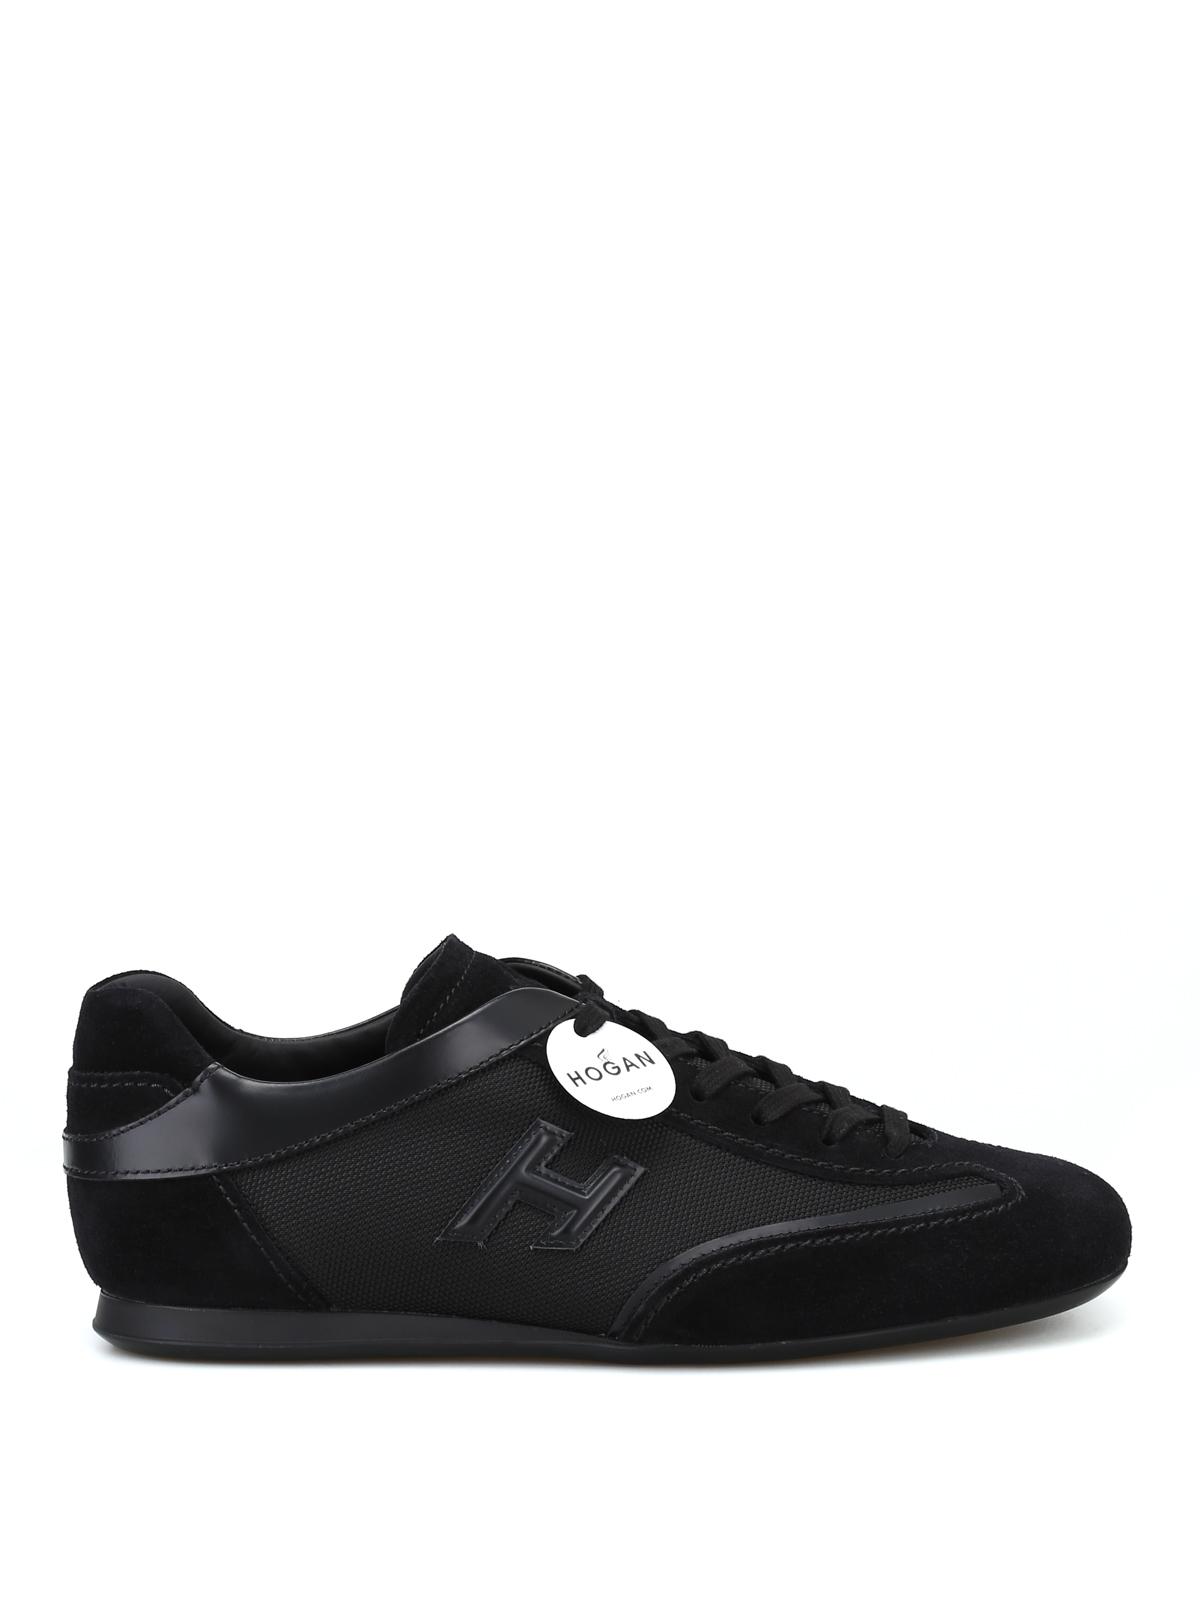 Trainers Hogan - Olympia black low top sneakers - HXM0570I972JC8B999